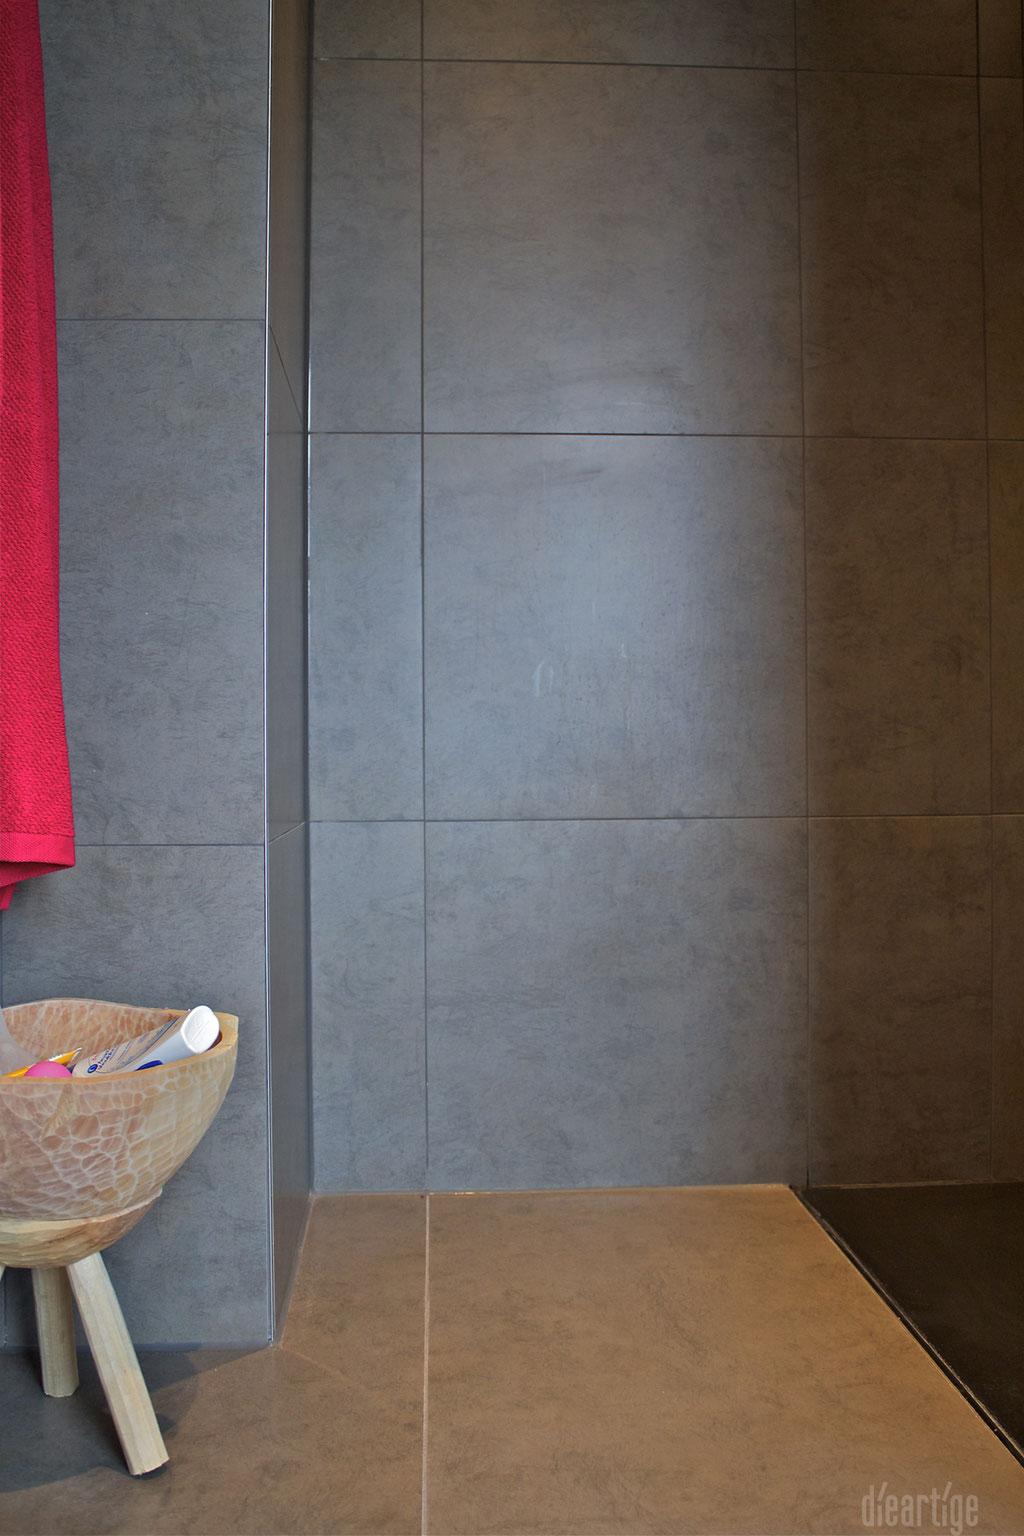 dieartigeUMBAU - Familie F. // Badezimmer // Dusche // anthrazitgraue Fliesen, Detail